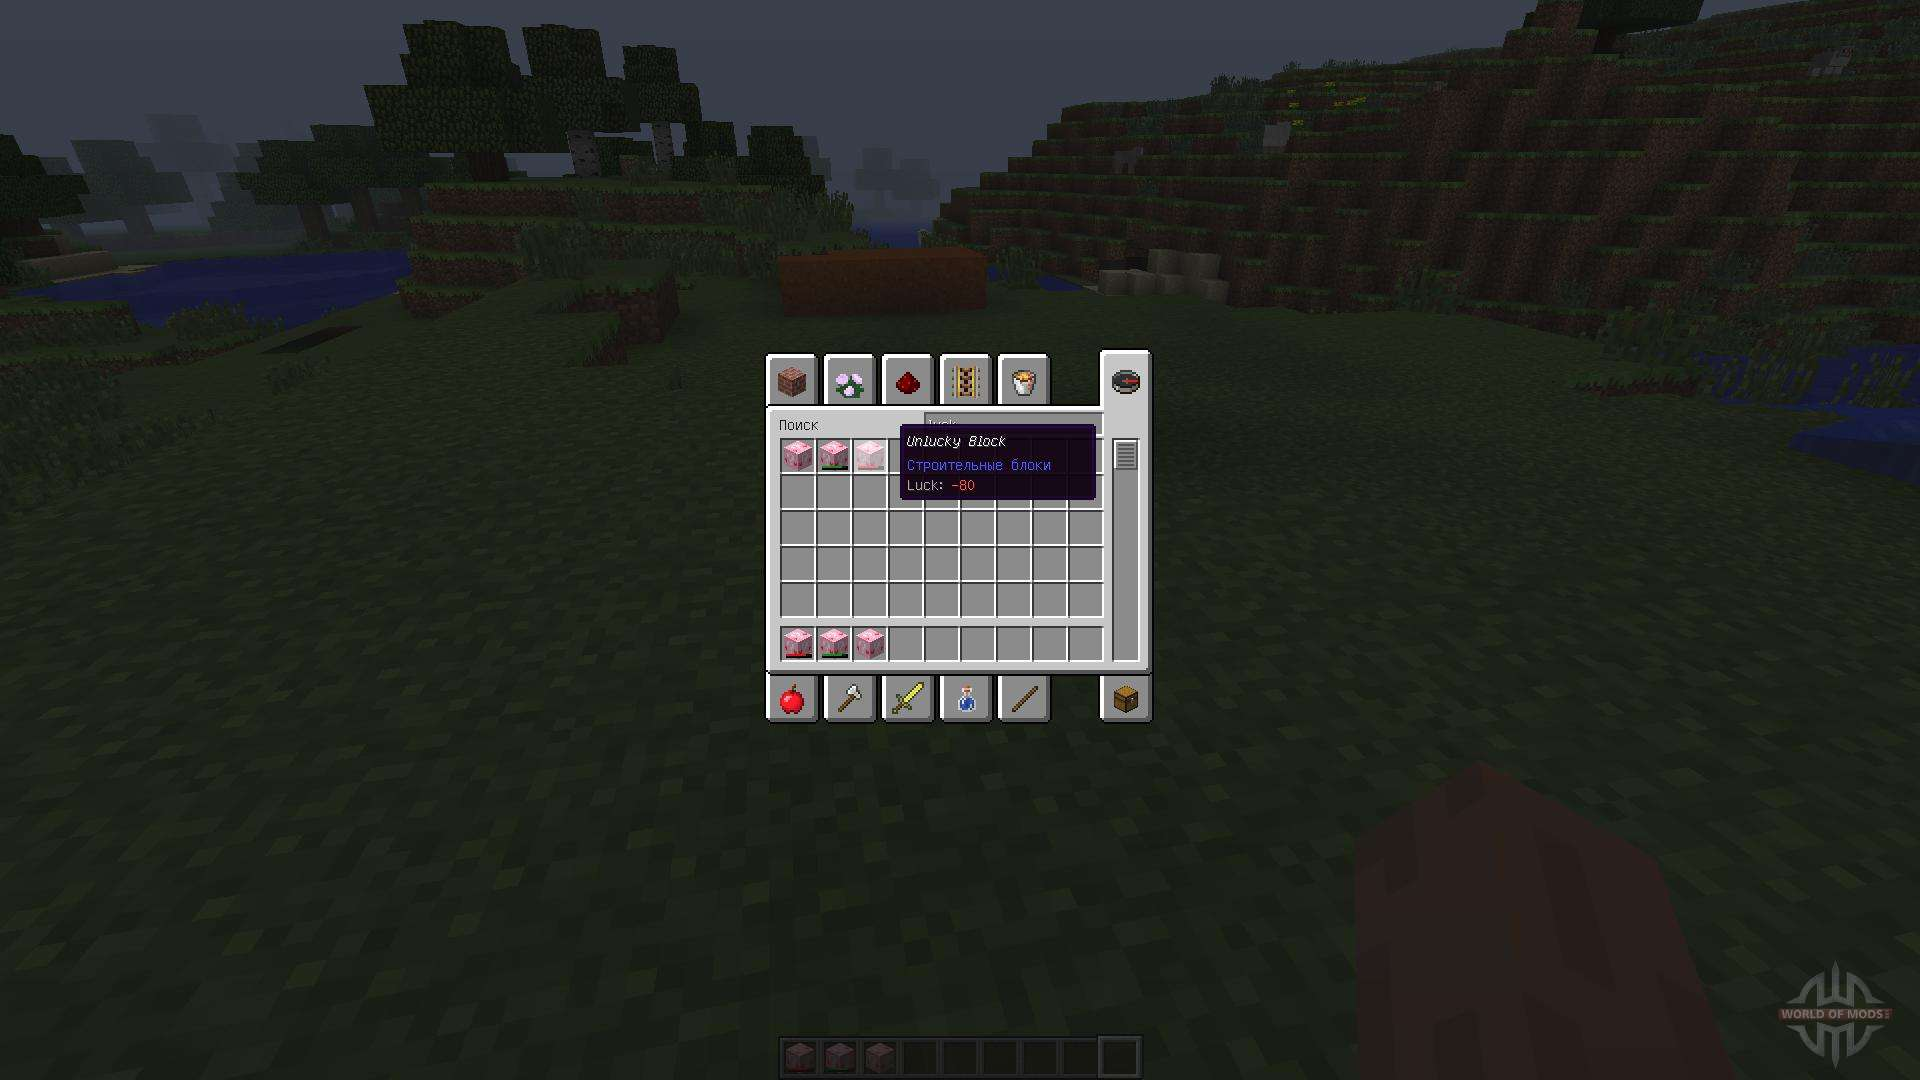 minecraft lucky block 1.7.10